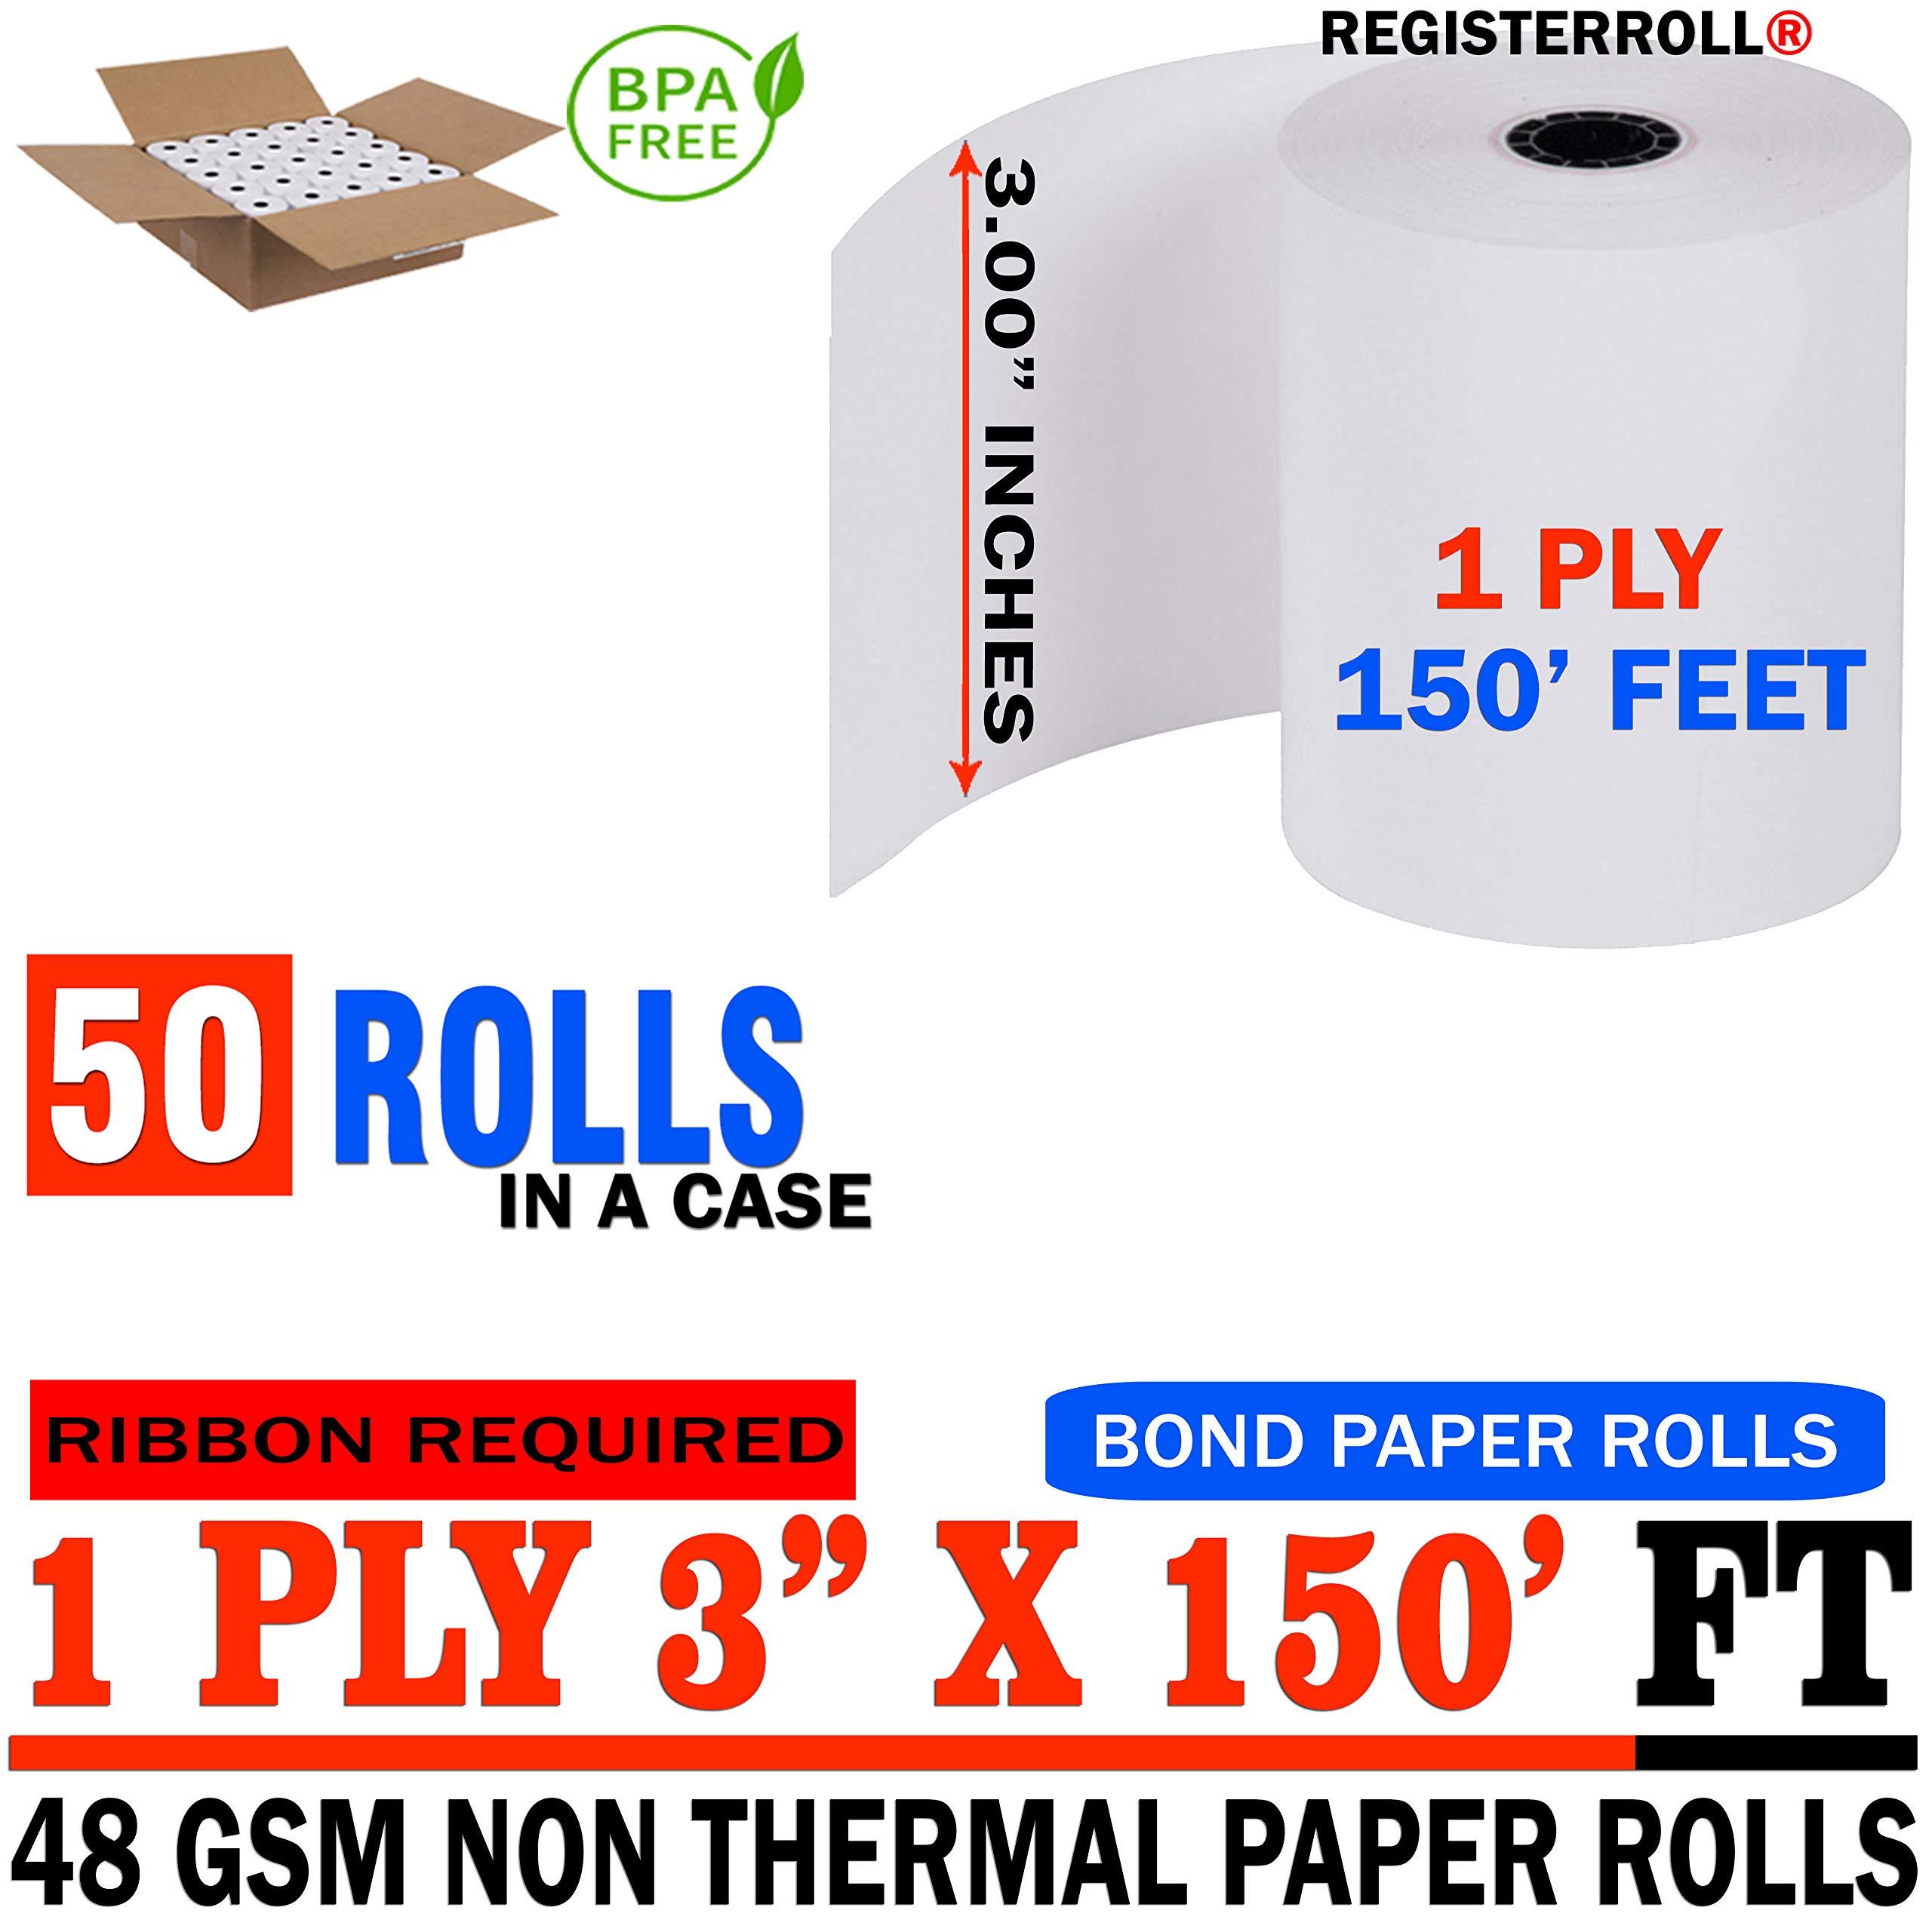 3 x 150' 1-ply Bond Paper 50 Rolls from RegisterRoll | Premium Quality Bond Paper by RegisterRolls